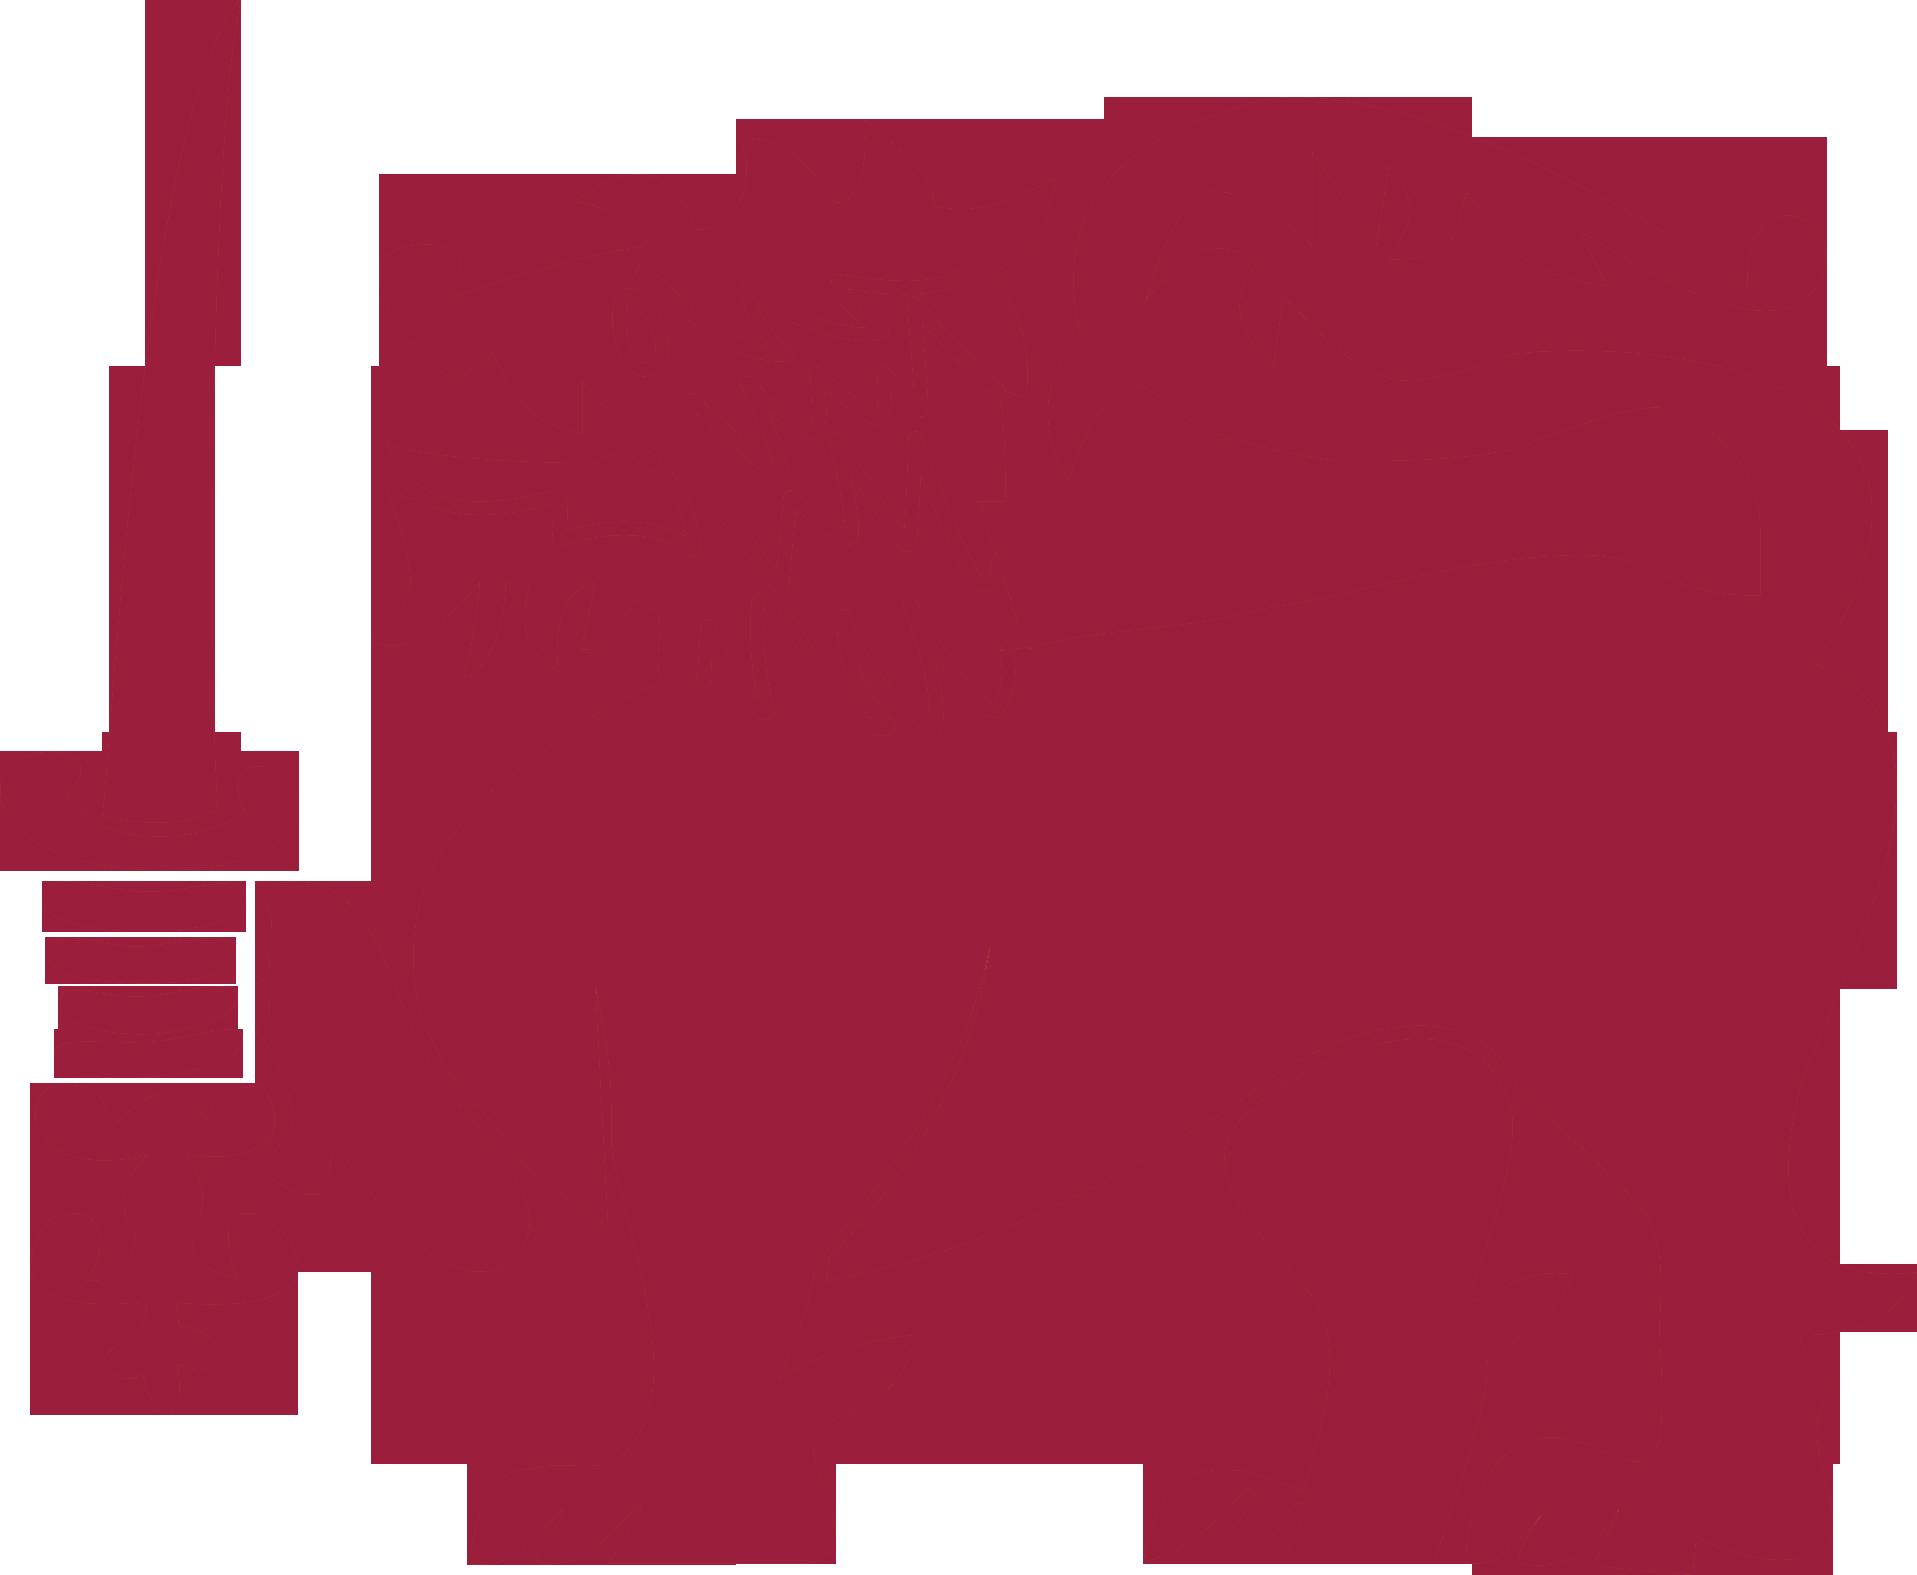 Sinhala Writing and Translation